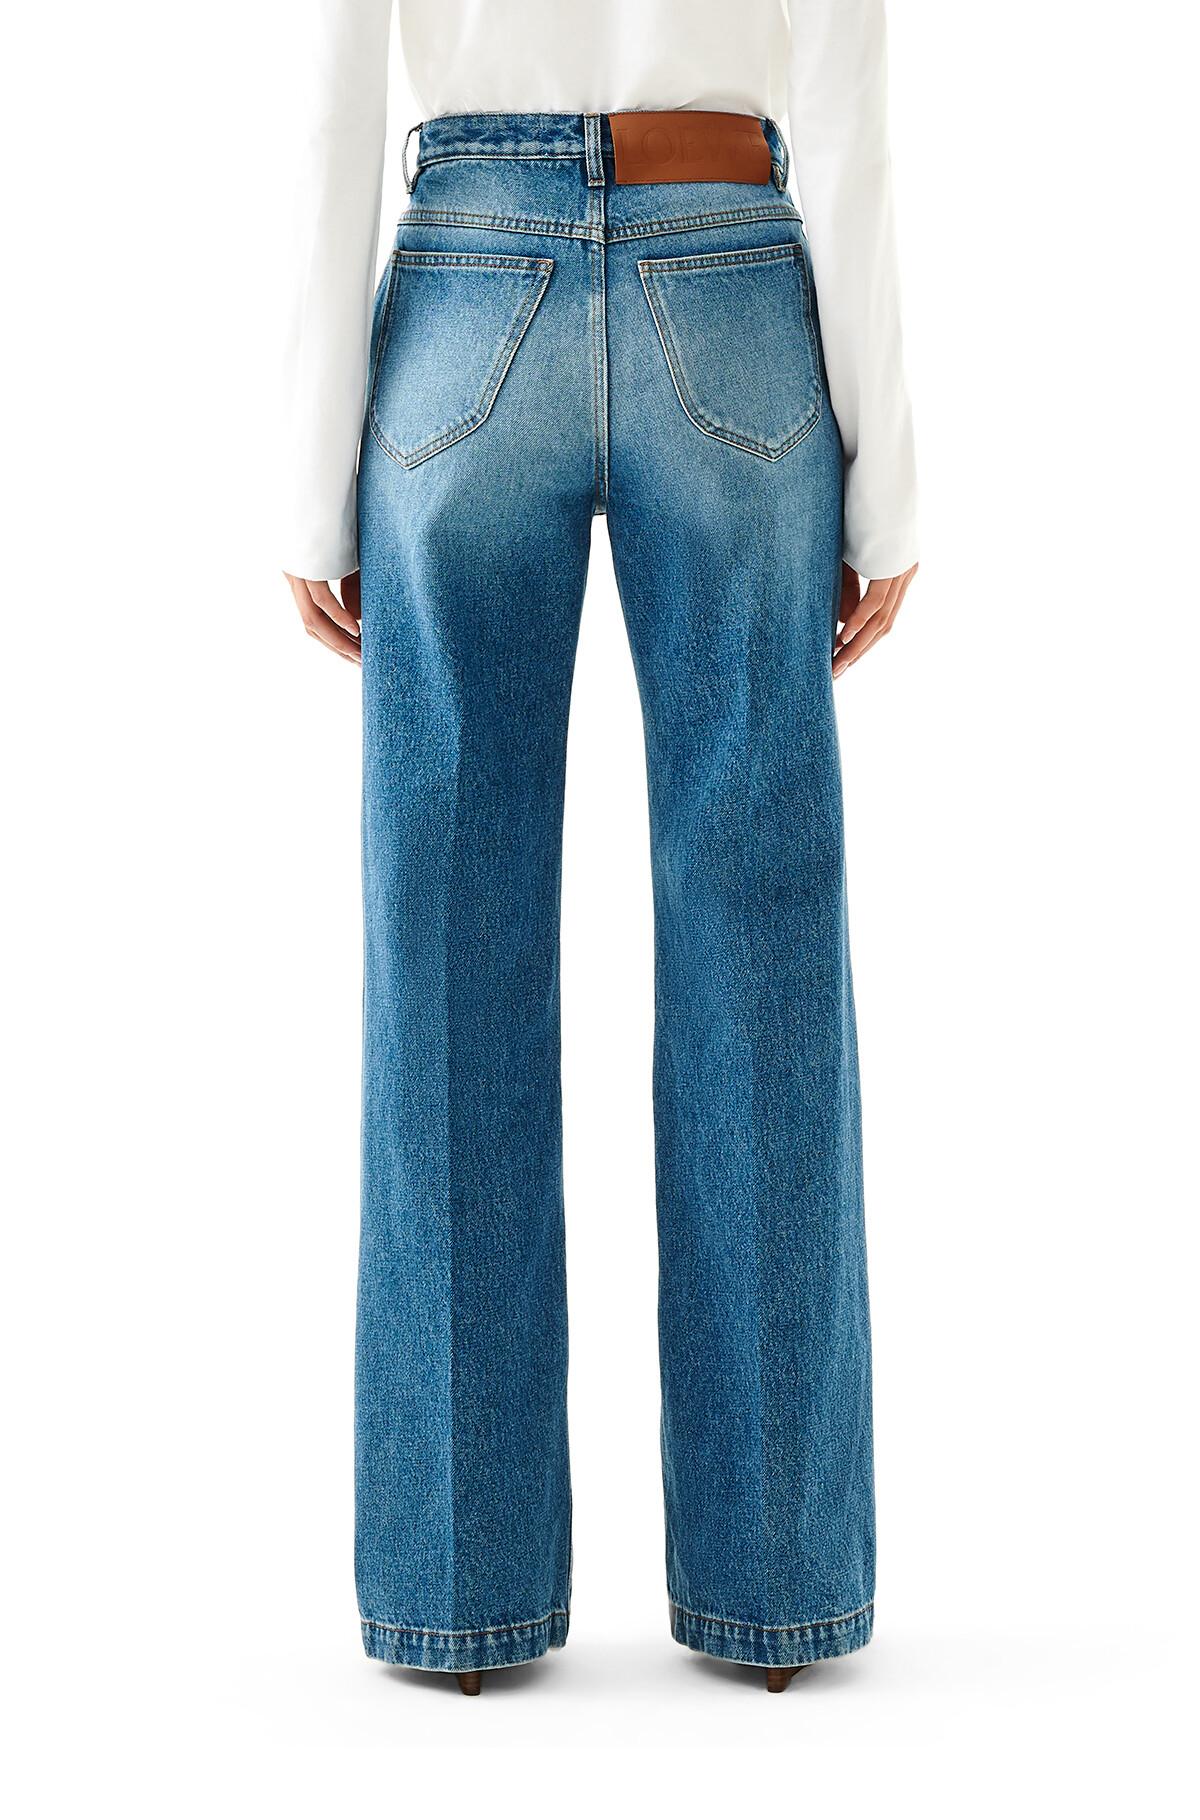 LOEWE Flare Denim Trousers washed denim front